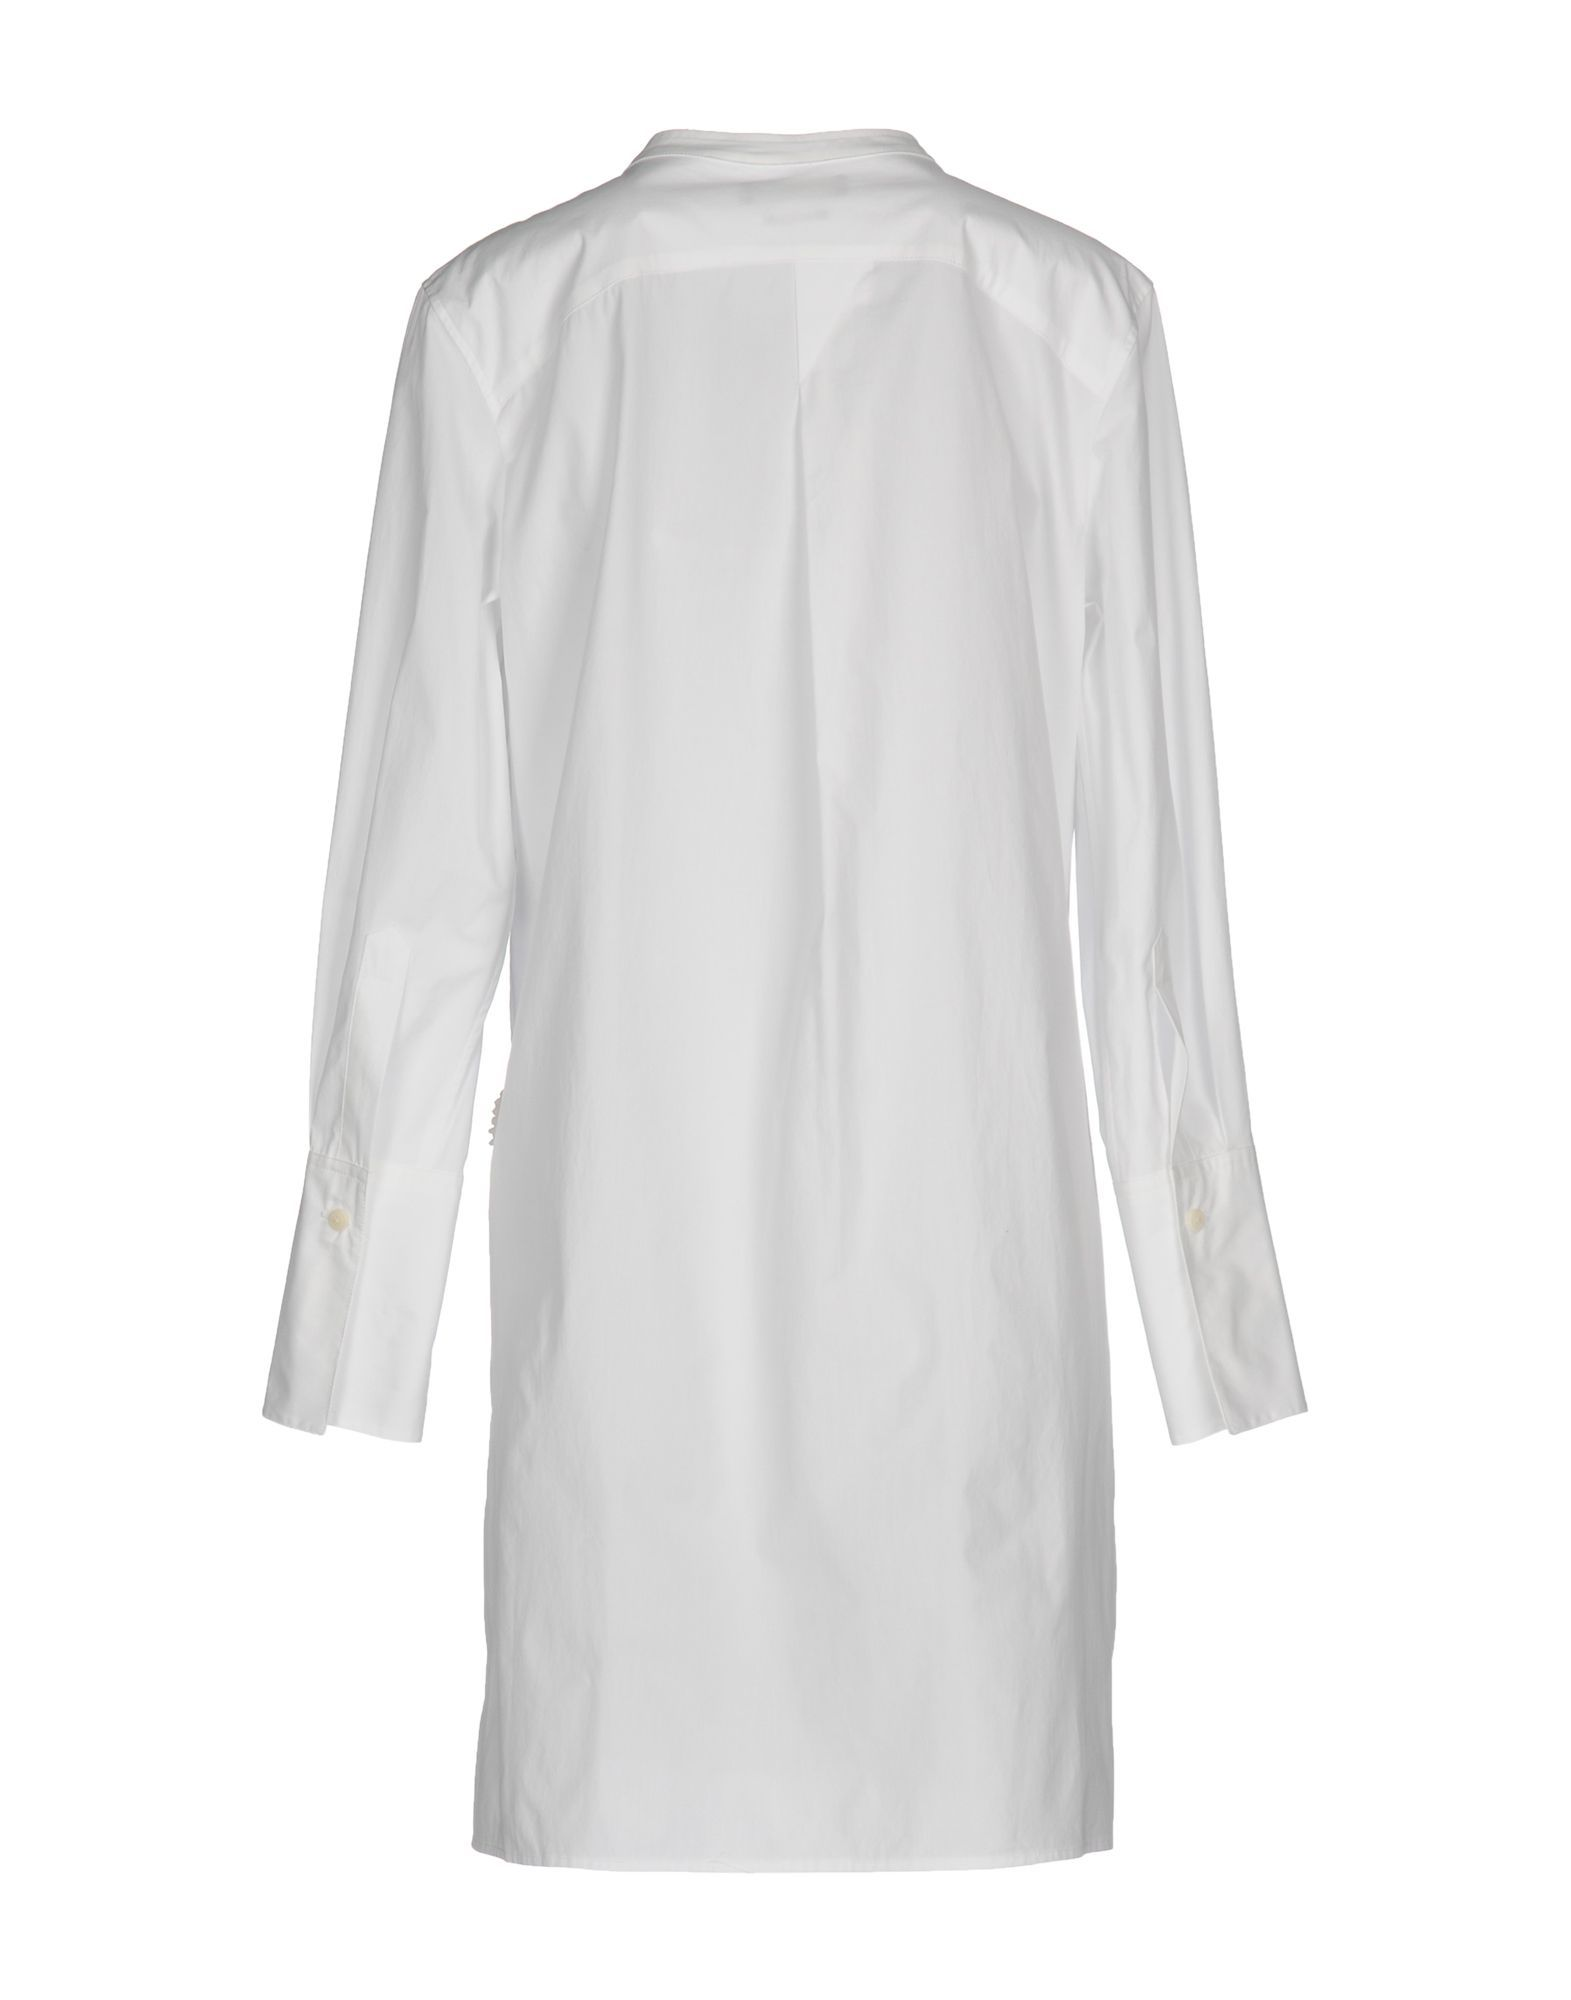 Isabel Marant White Cotton Shirt Dress